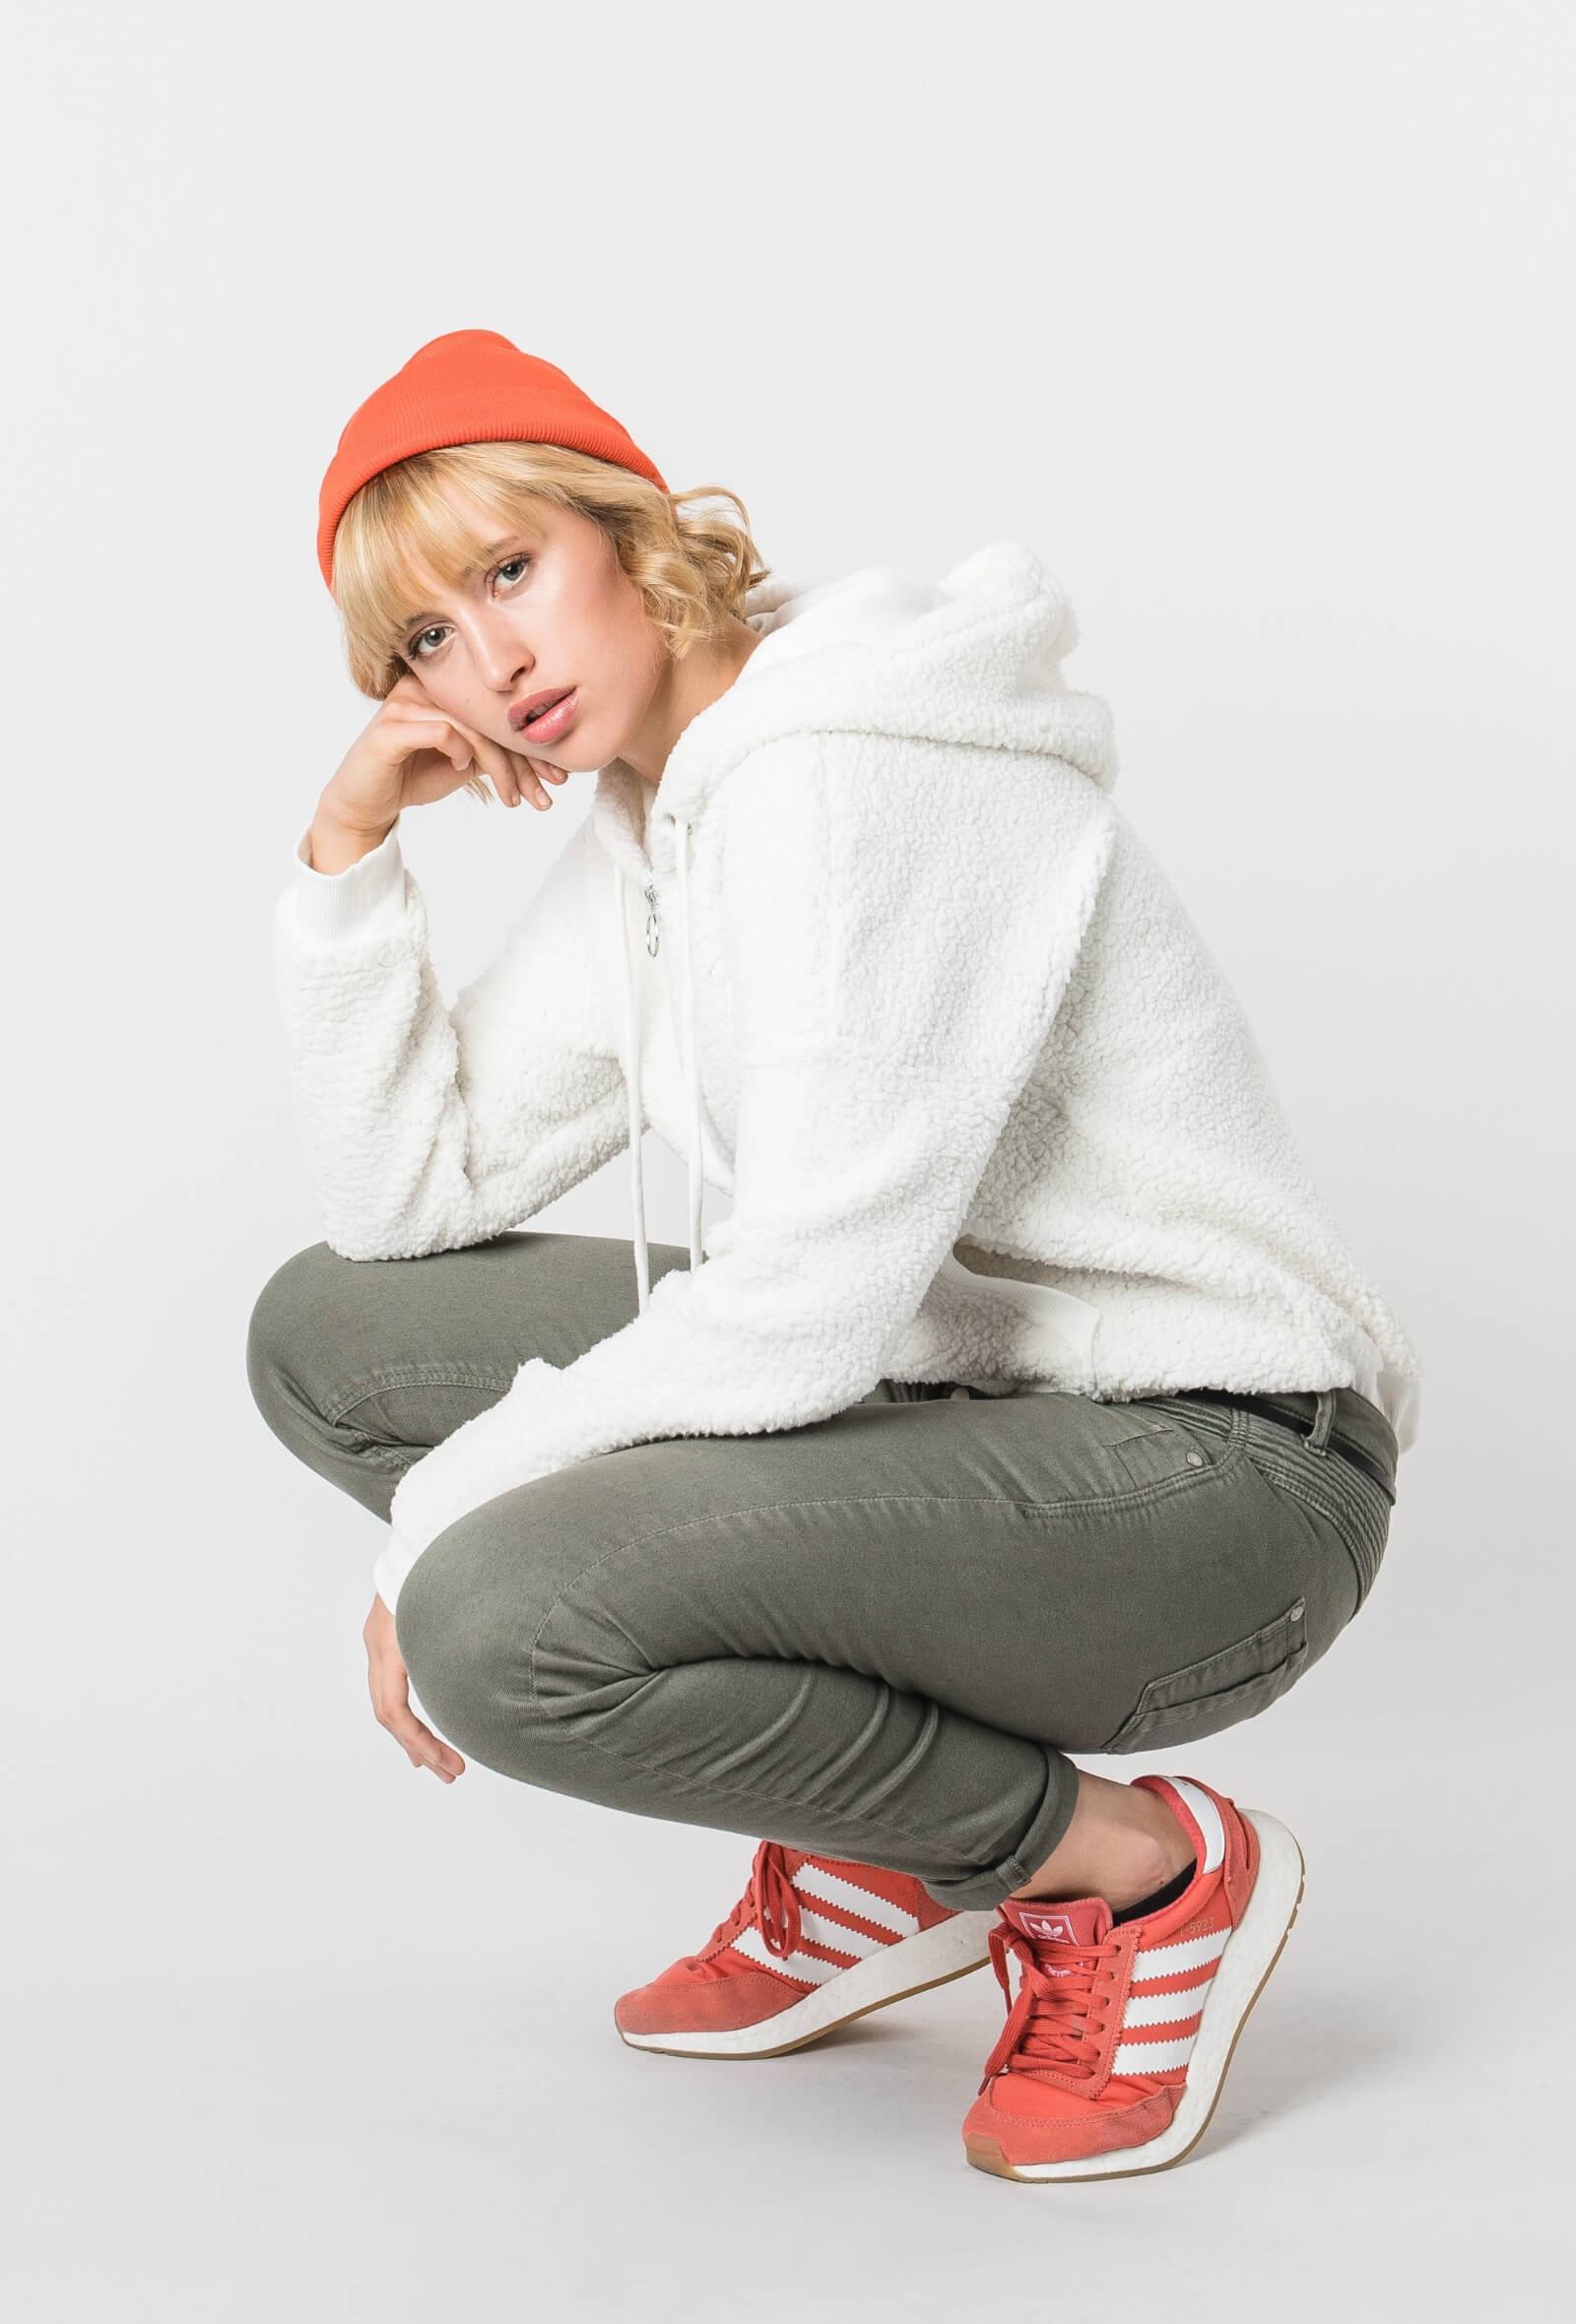 Outfit im Kuschel-Hoodie